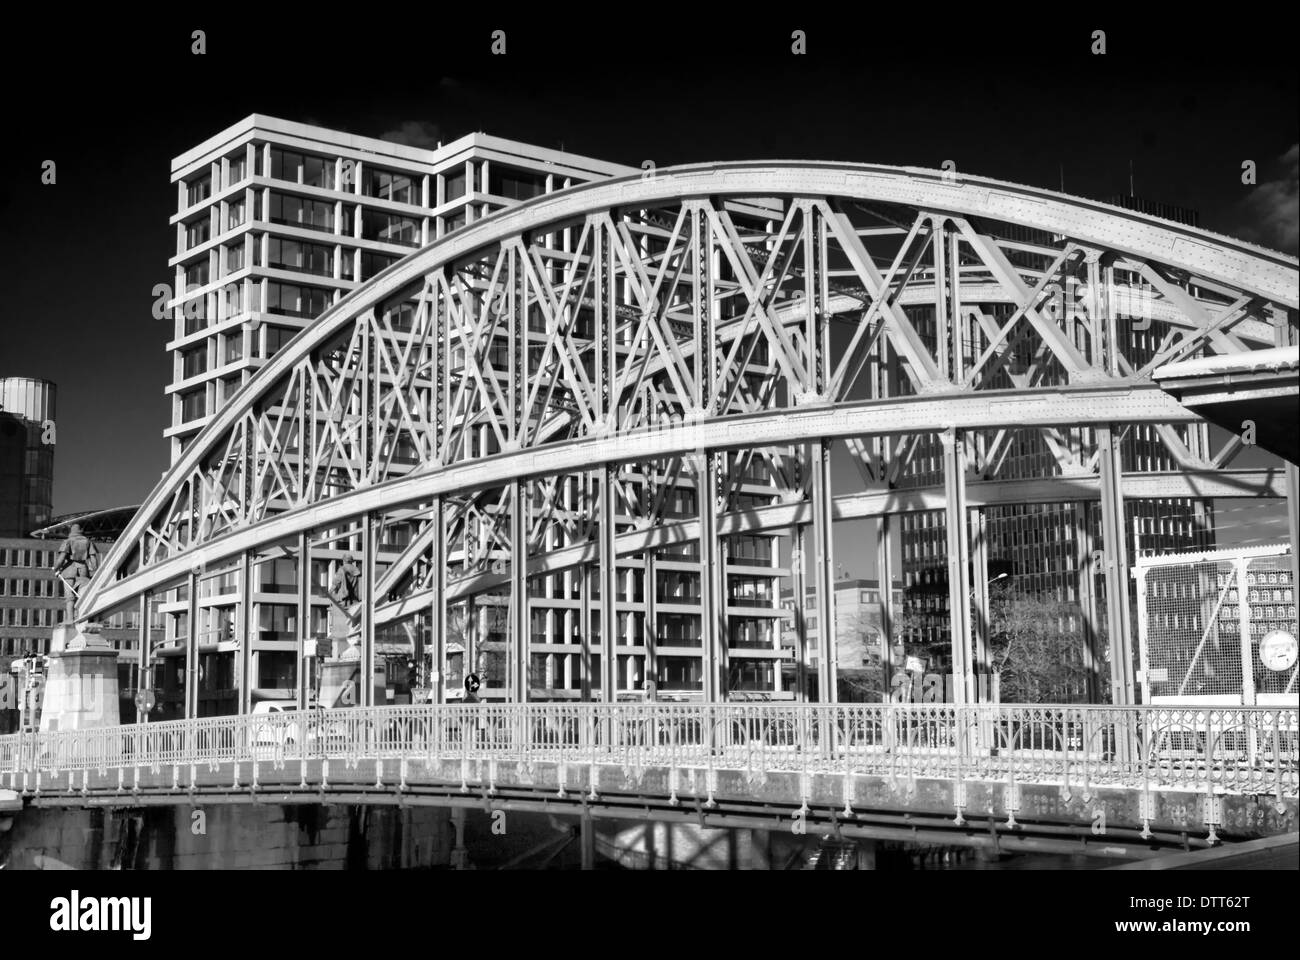 Hamburg and its Bridges Stock Photo